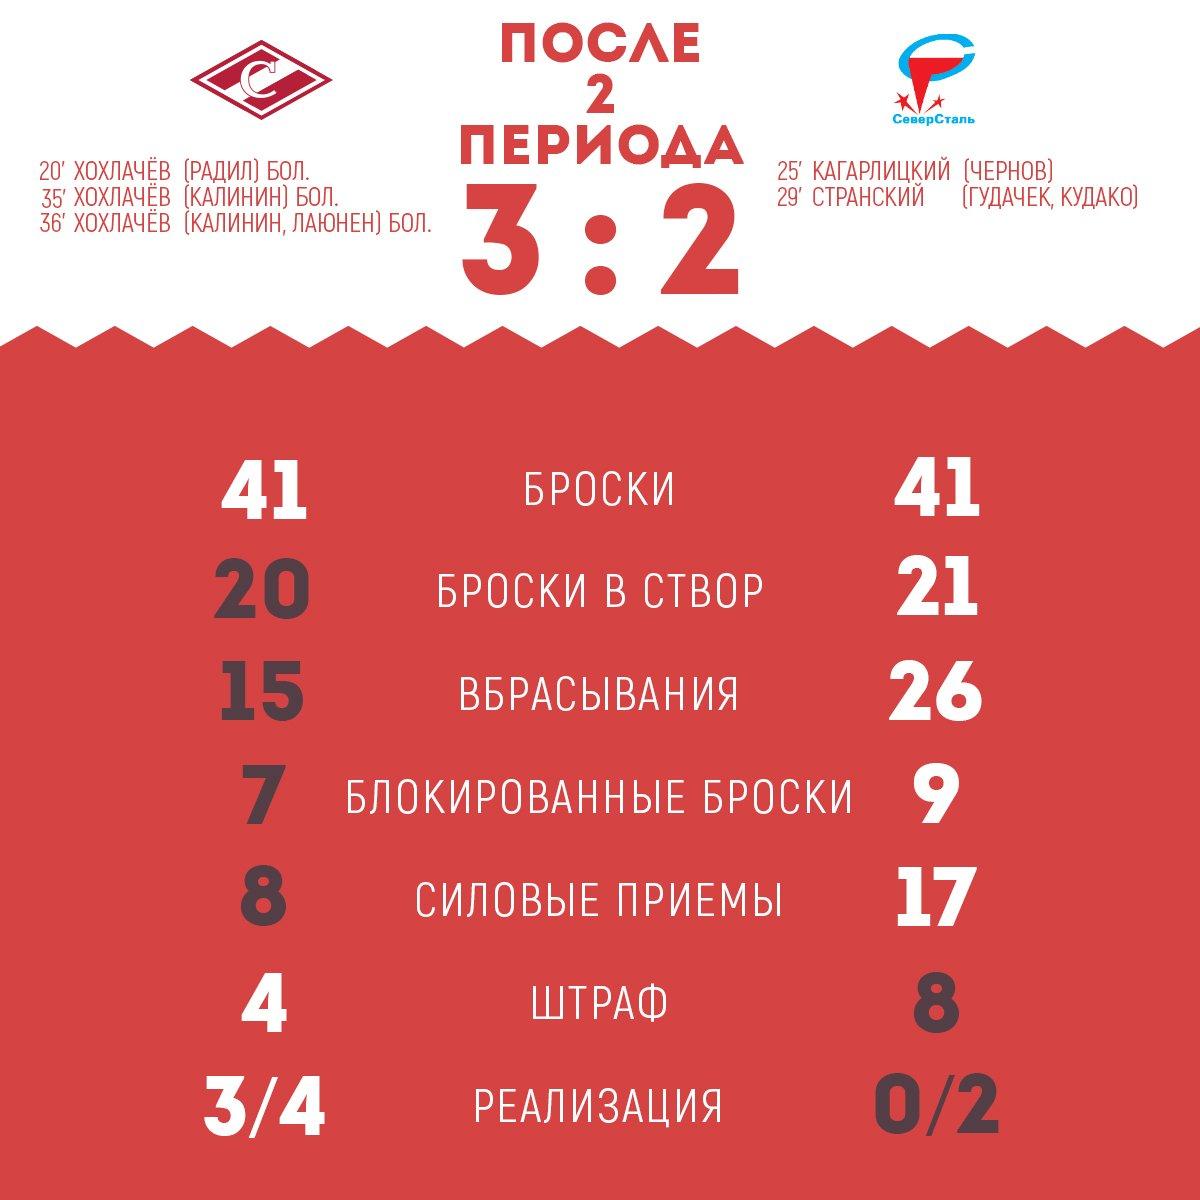 Статистика матча «Спартак» vs «Северсталь» после 2-го периода